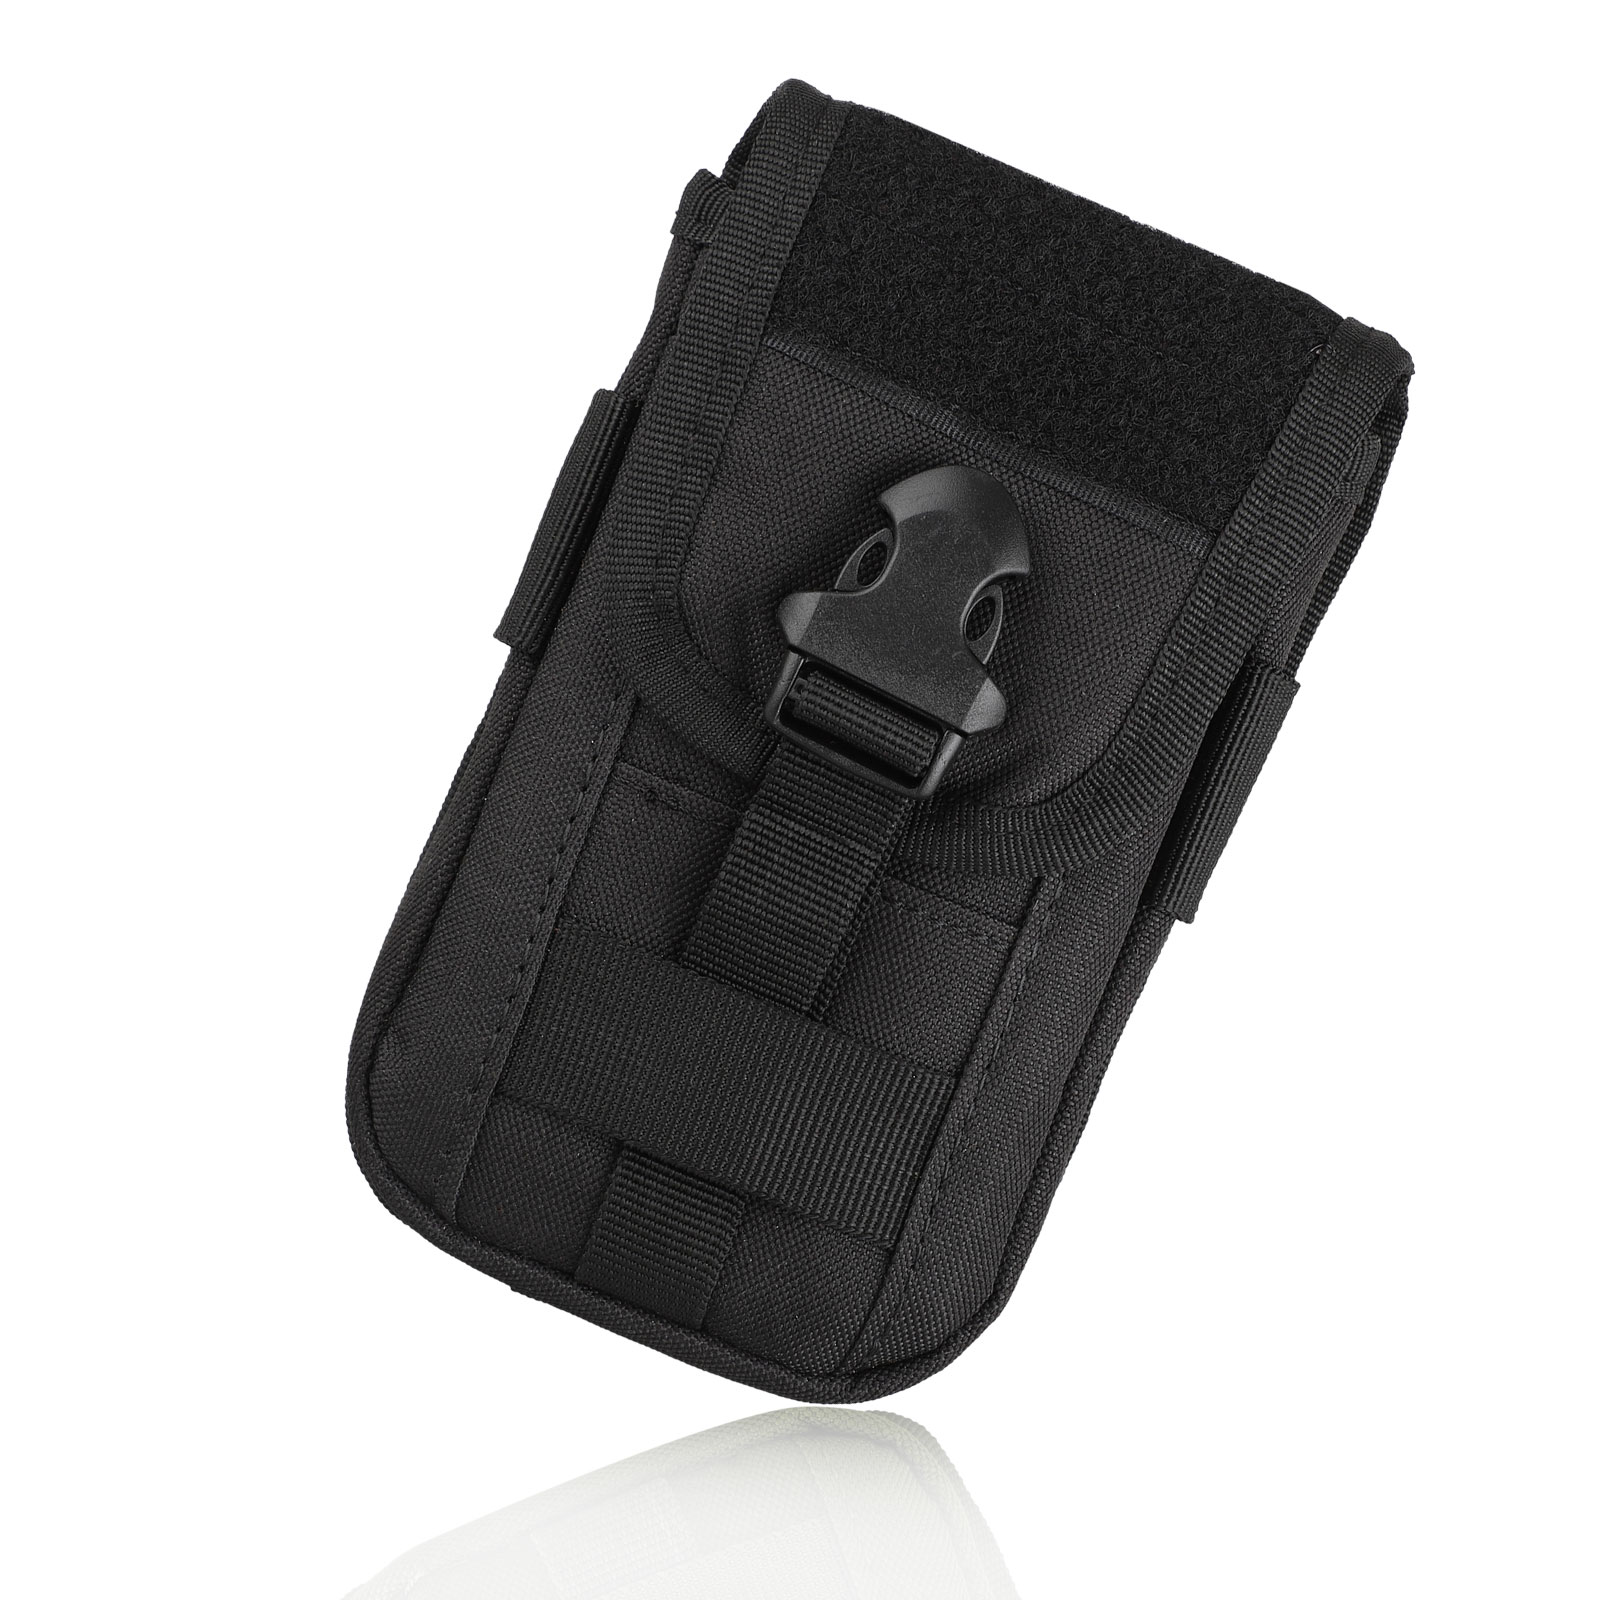 Universal-Tactical-Cell-Phone-Belt-Pack-Bag-Pocket-Molle-Waist-Pouch-Case thumbnail 10